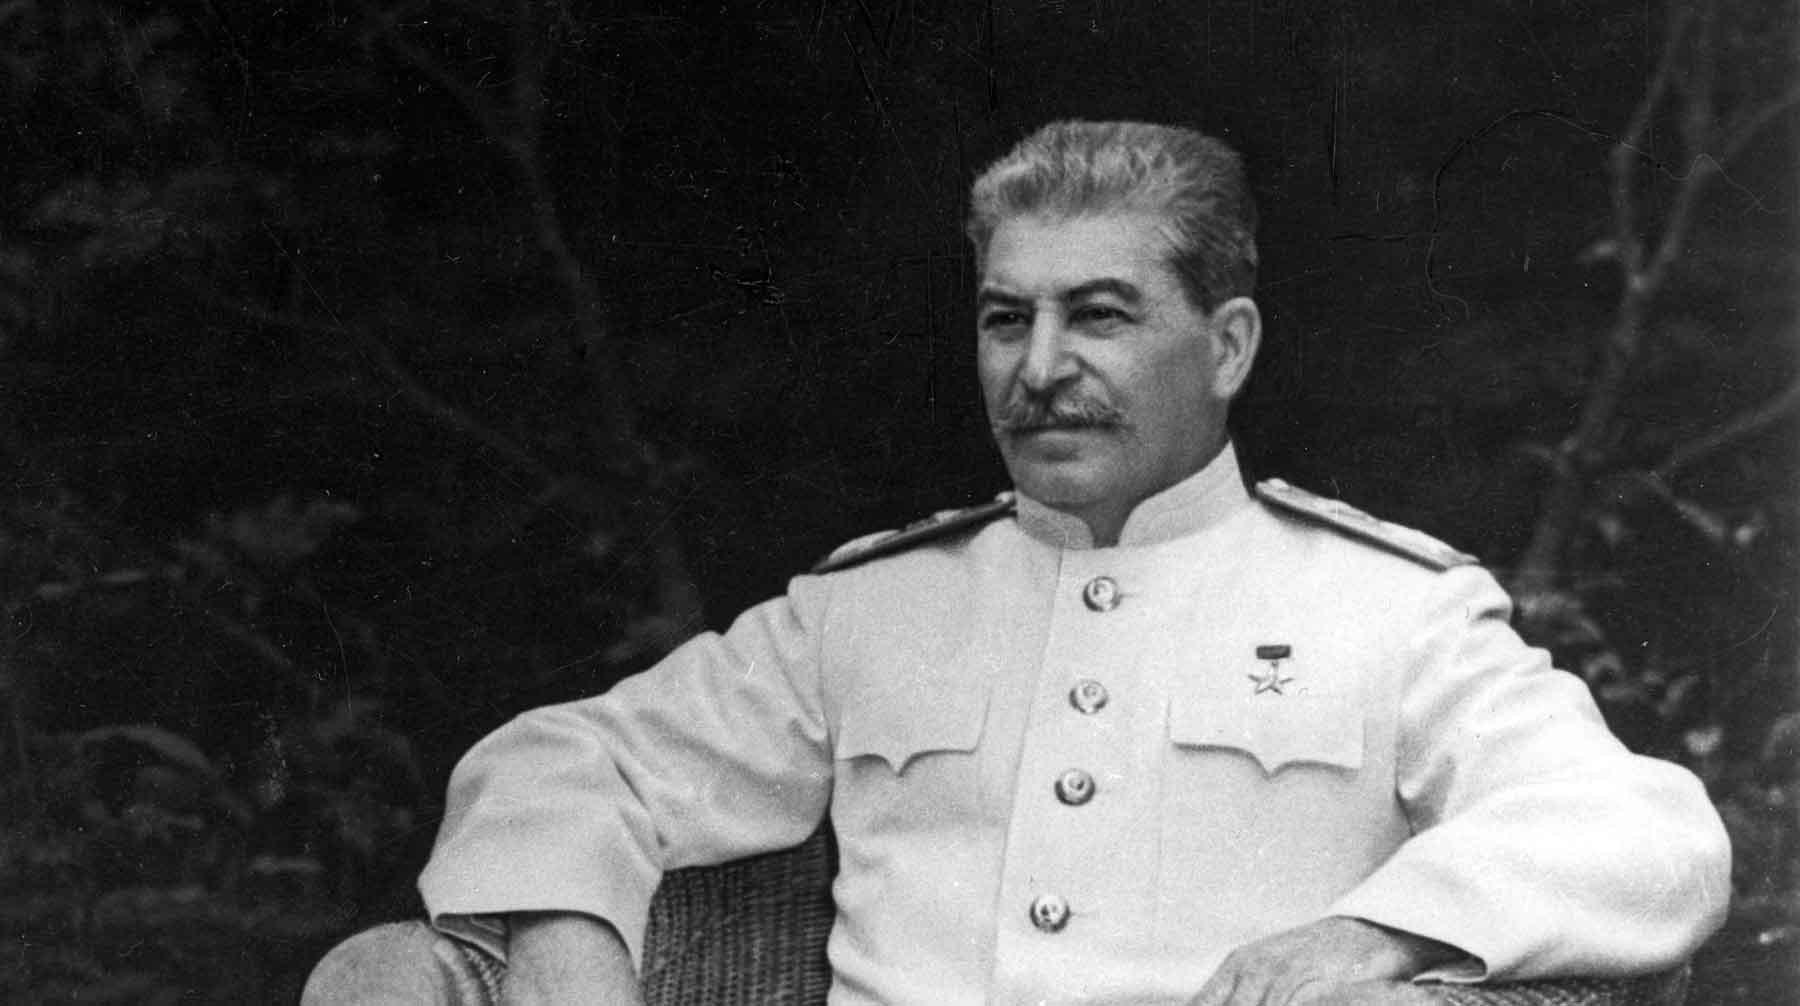 «Папаша все забрал — и дело с концом»: Путин упомянул Сталина, говоря о Курилах